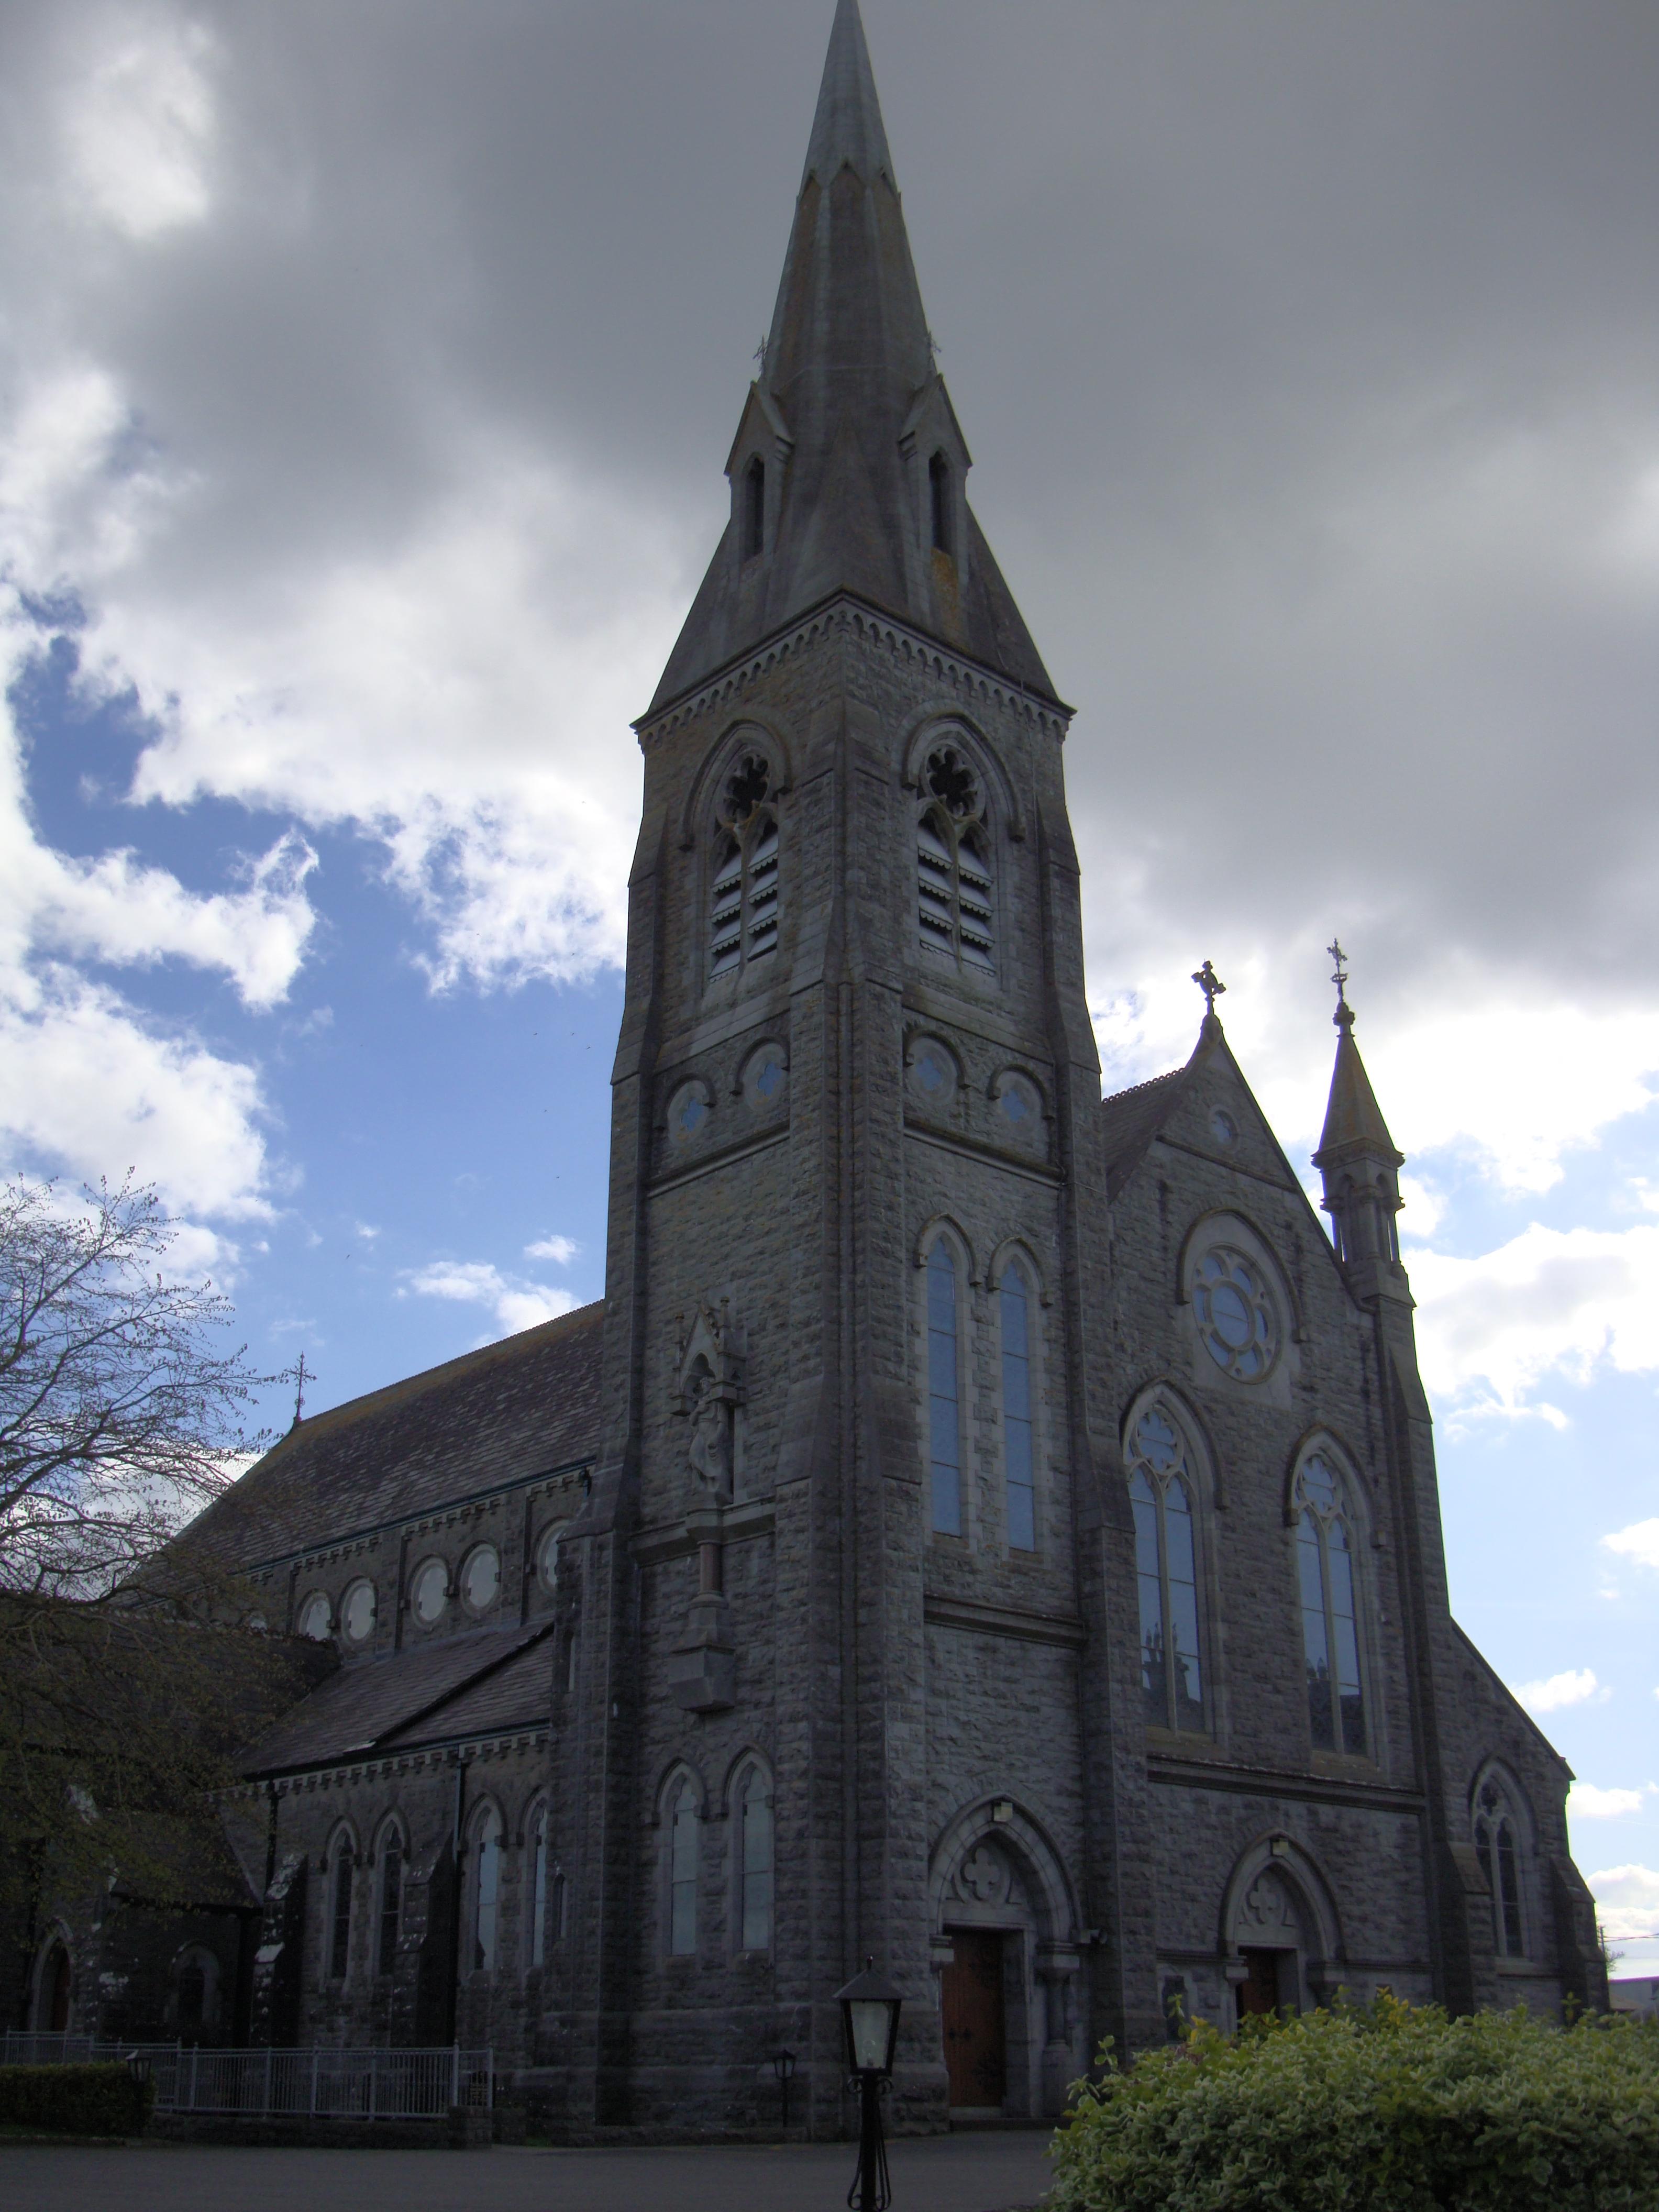 Car Rentals in Loughrea, Galway: Cheap Rental Car Deals